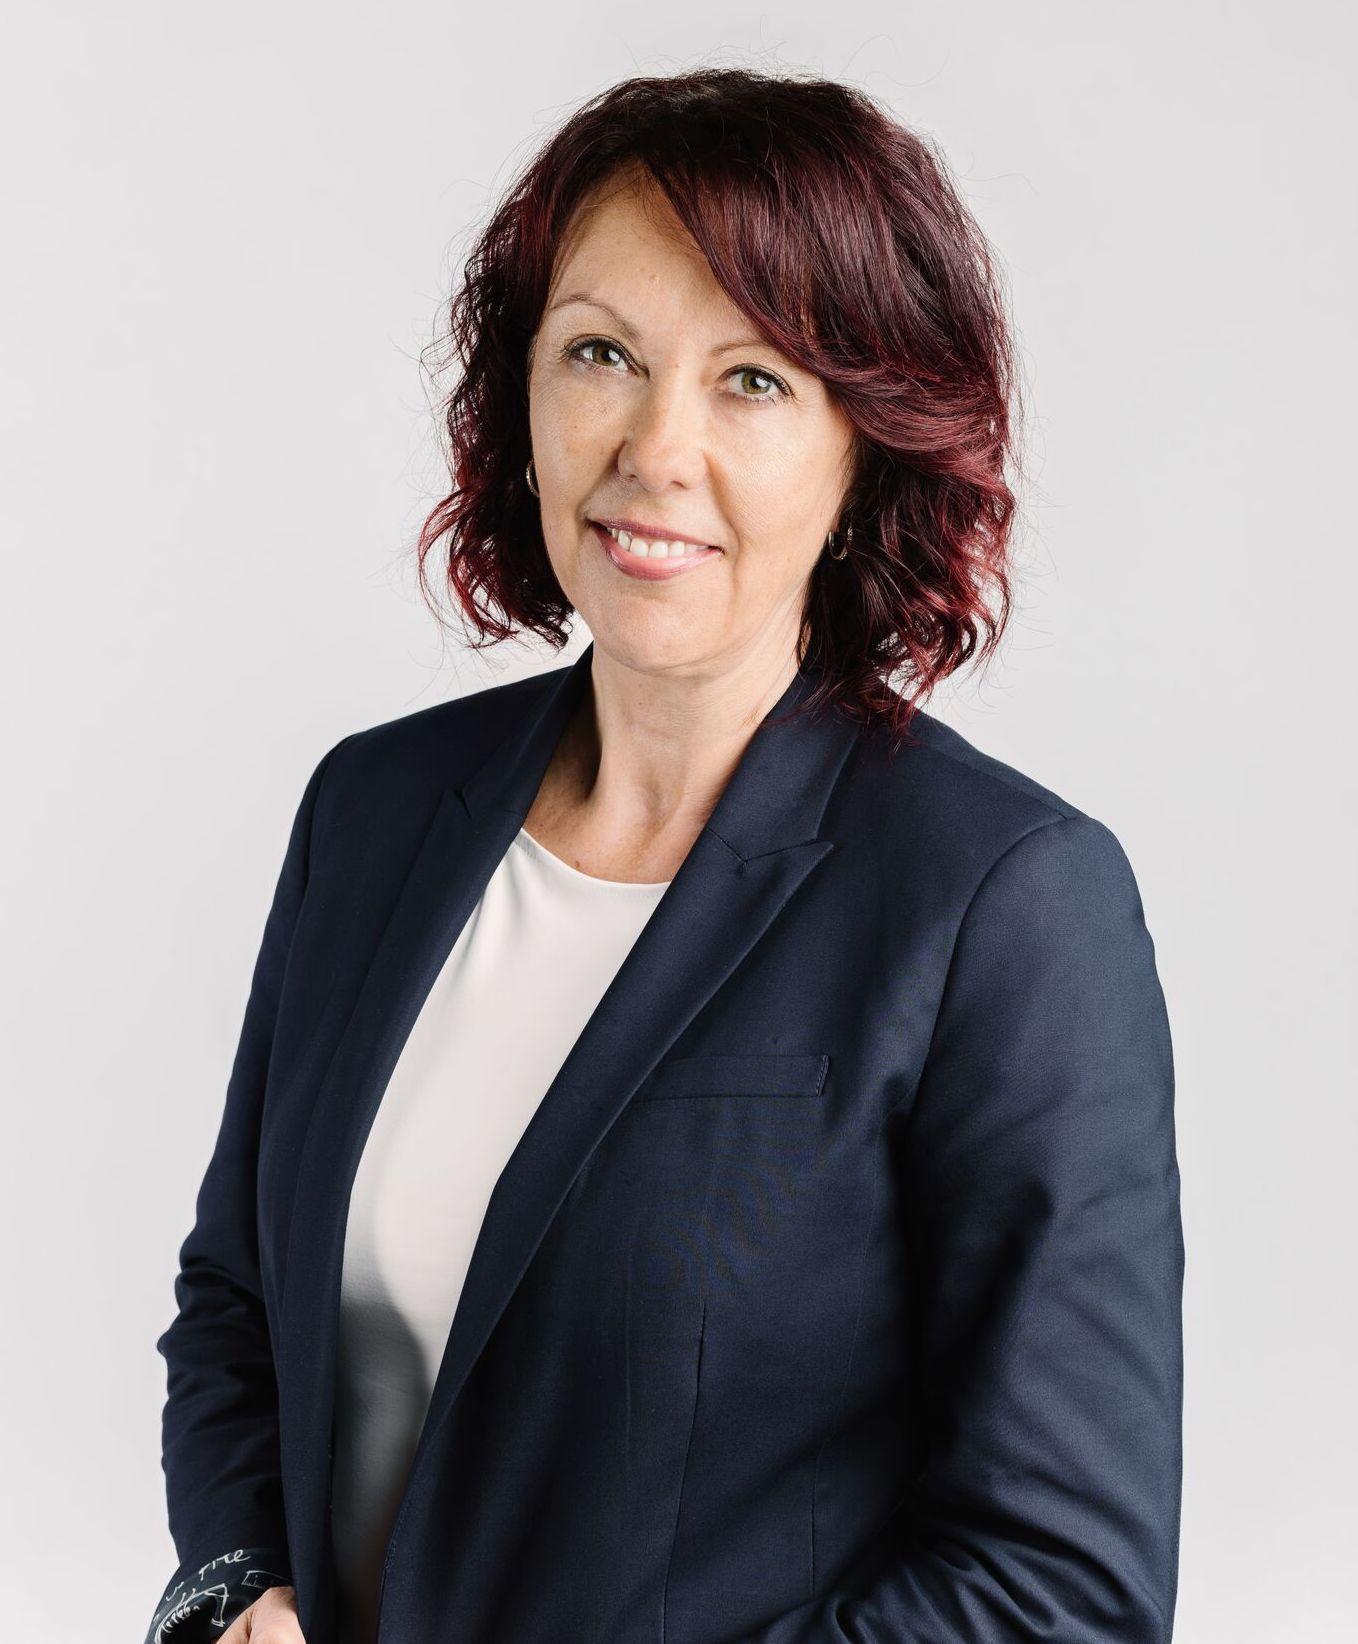 Sylvie Veilleux - Independent Member